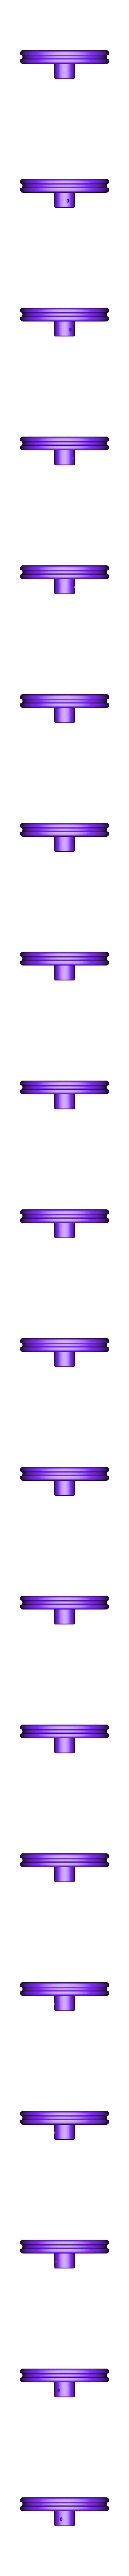 TOP PULLEY.stl Download STL file STEAM POWERED FERRIS WHEEL • 3D print model, Boxermad84